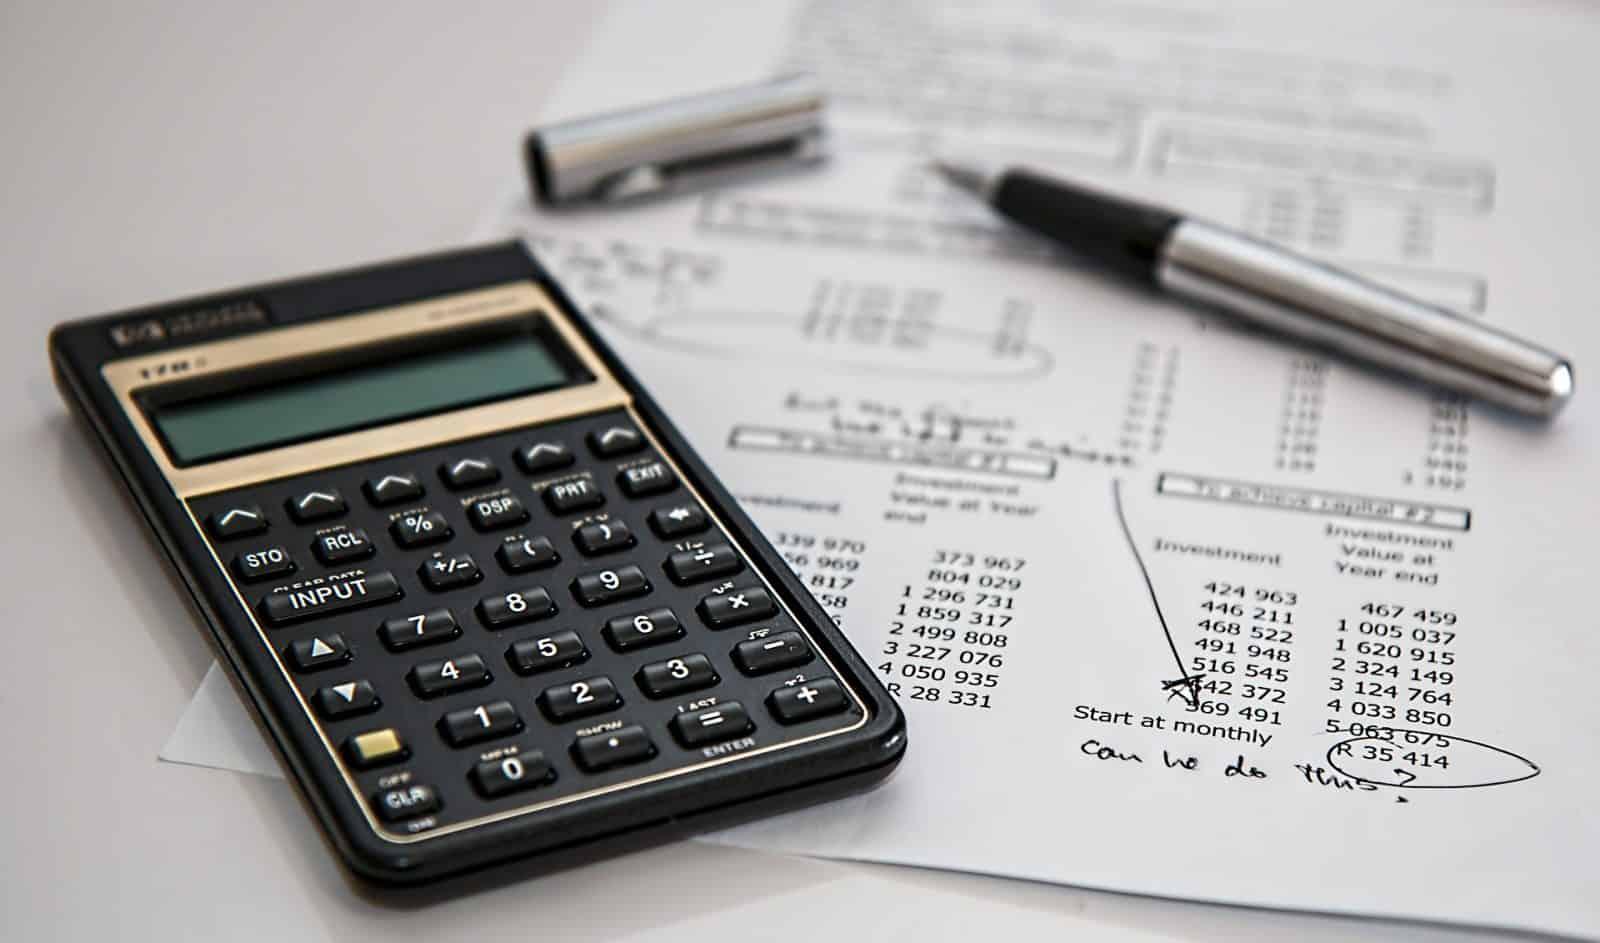 Jurnal Akuntansi: Trik Memahami & Menyusun Laporan Keuangan